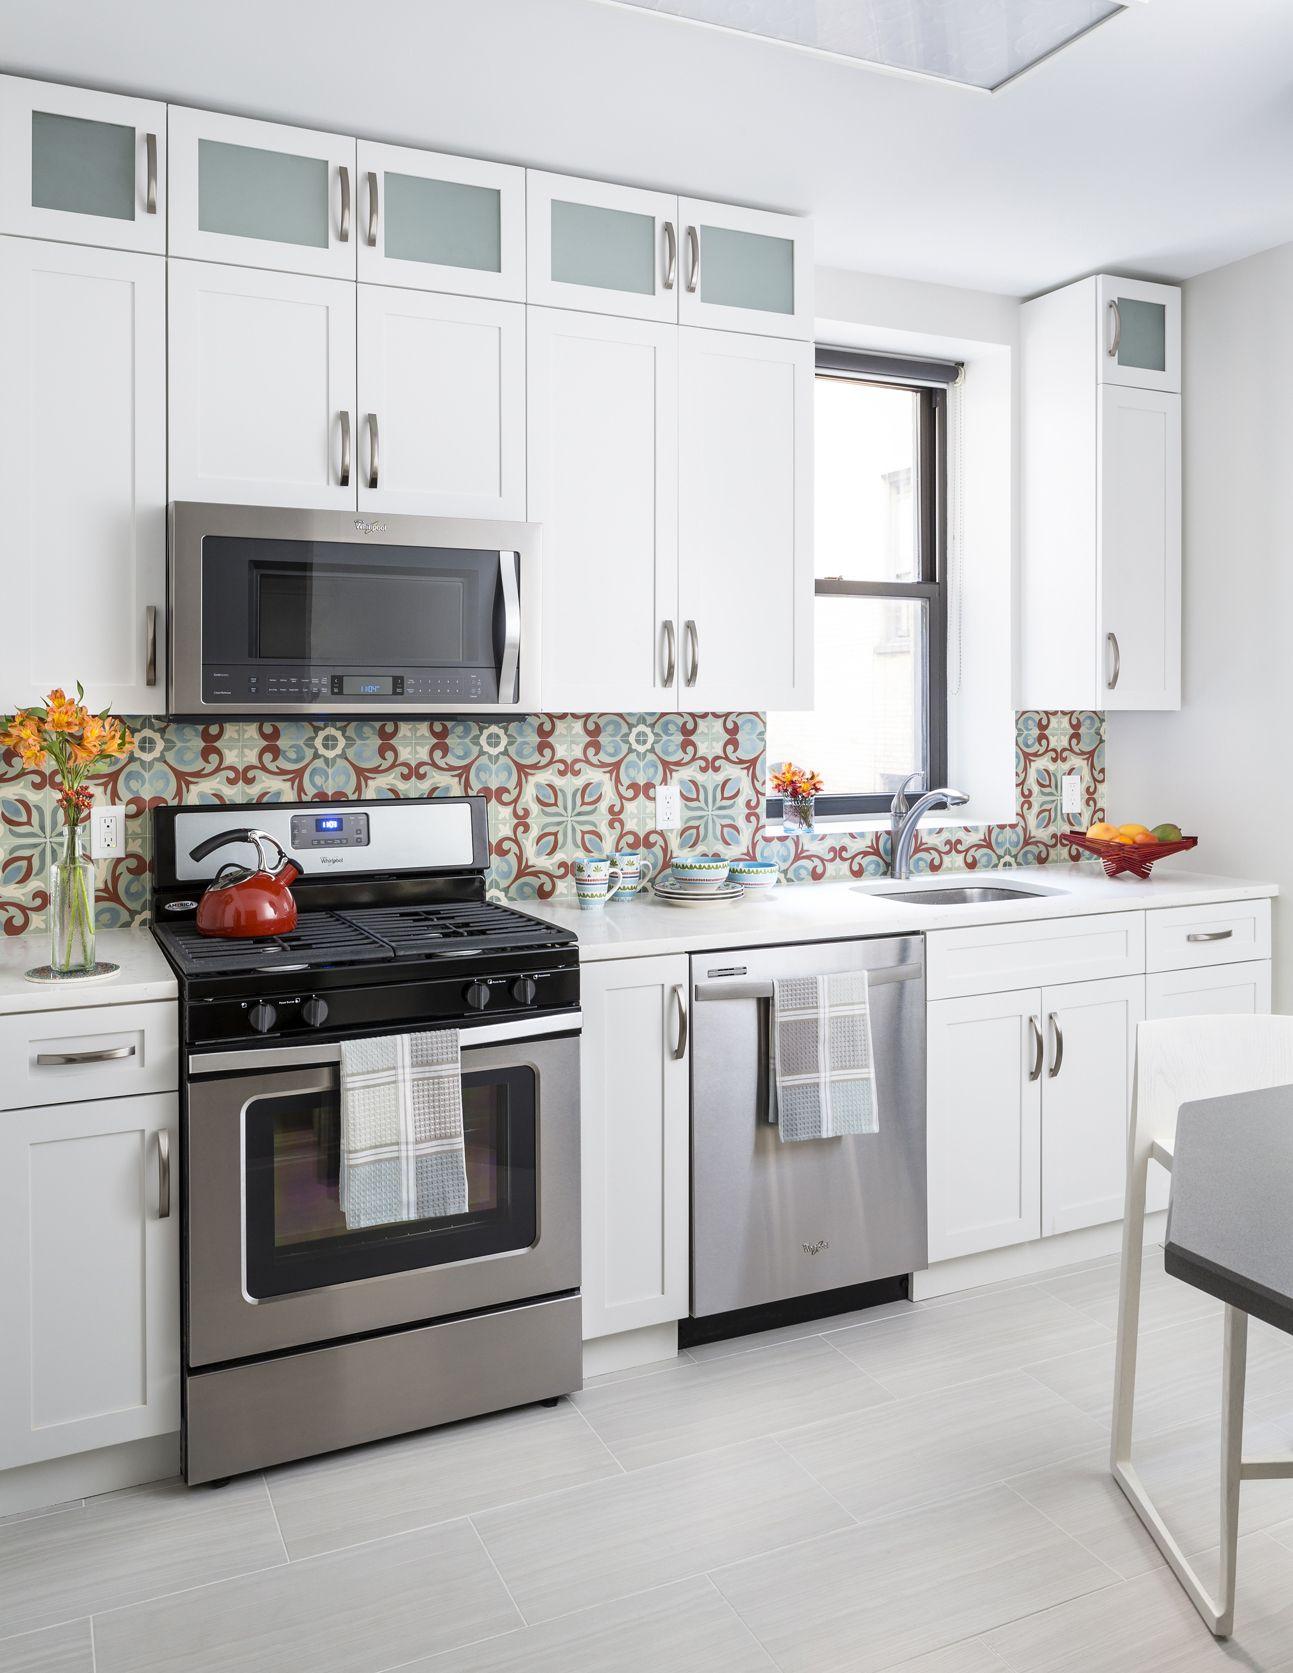 UWS Manhattan kitchen Designed by Tobi Wright of InsideWright ...